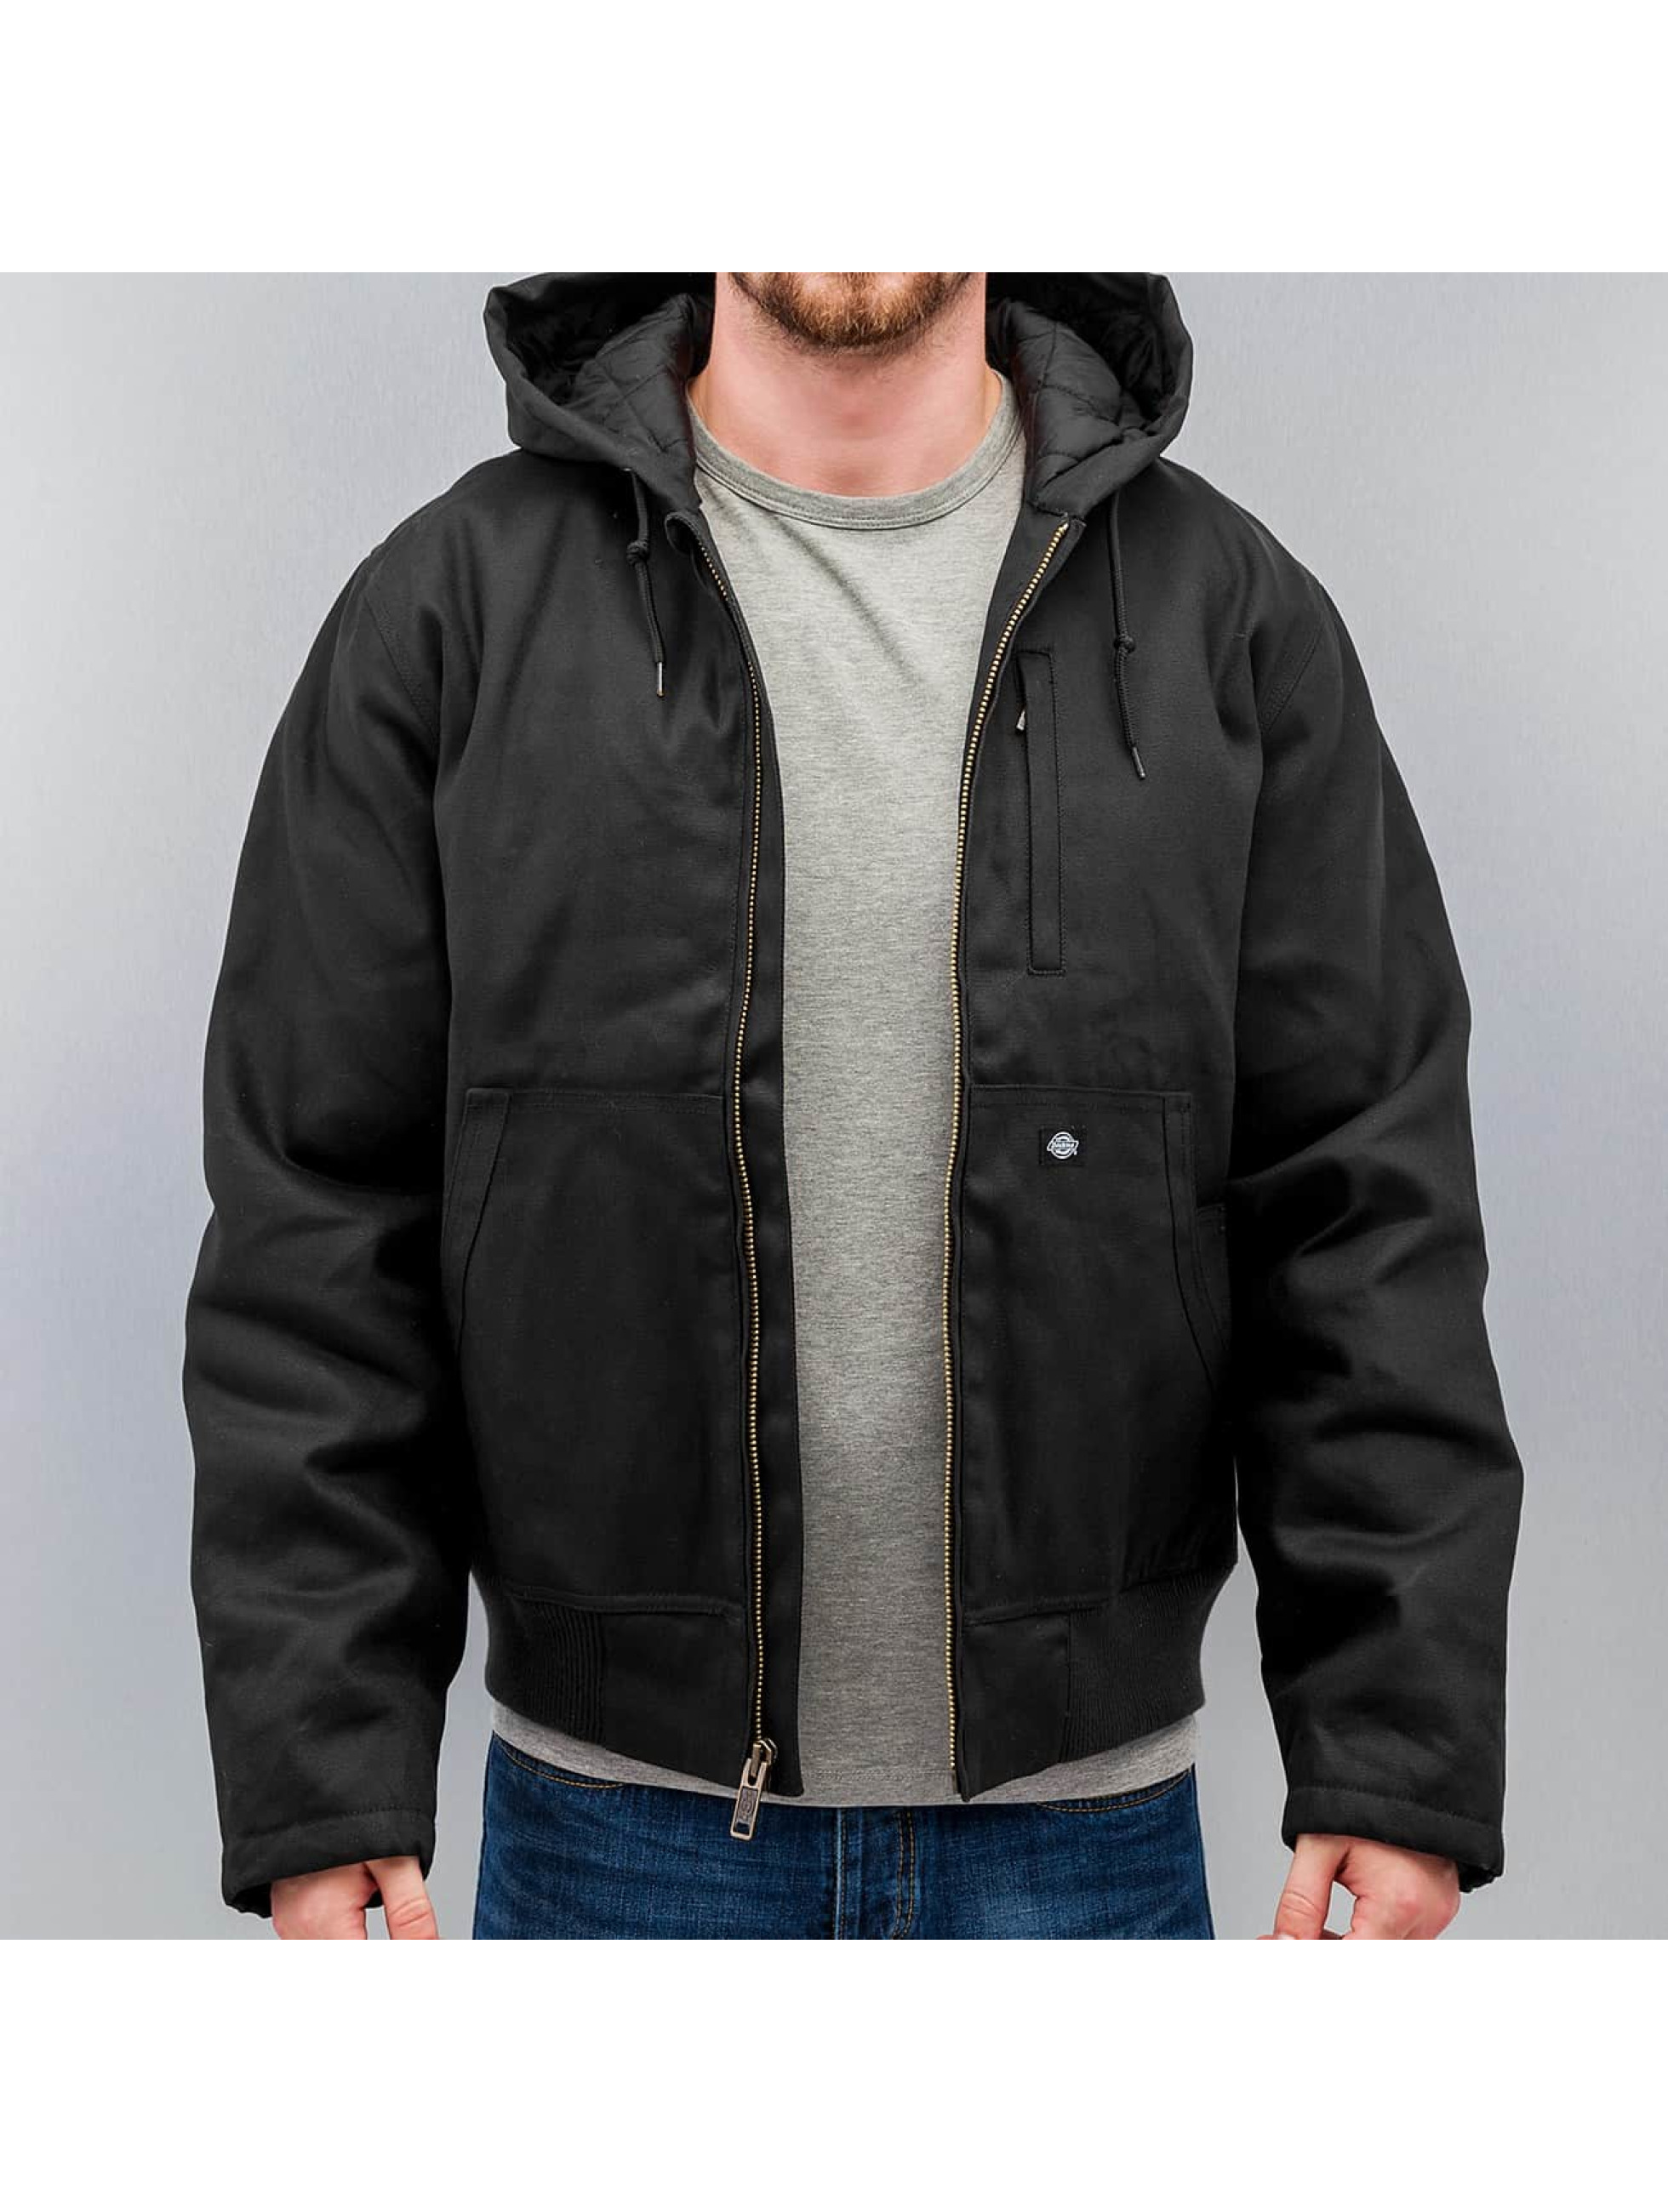 Jacke schwarz Nylon Jacken dickies